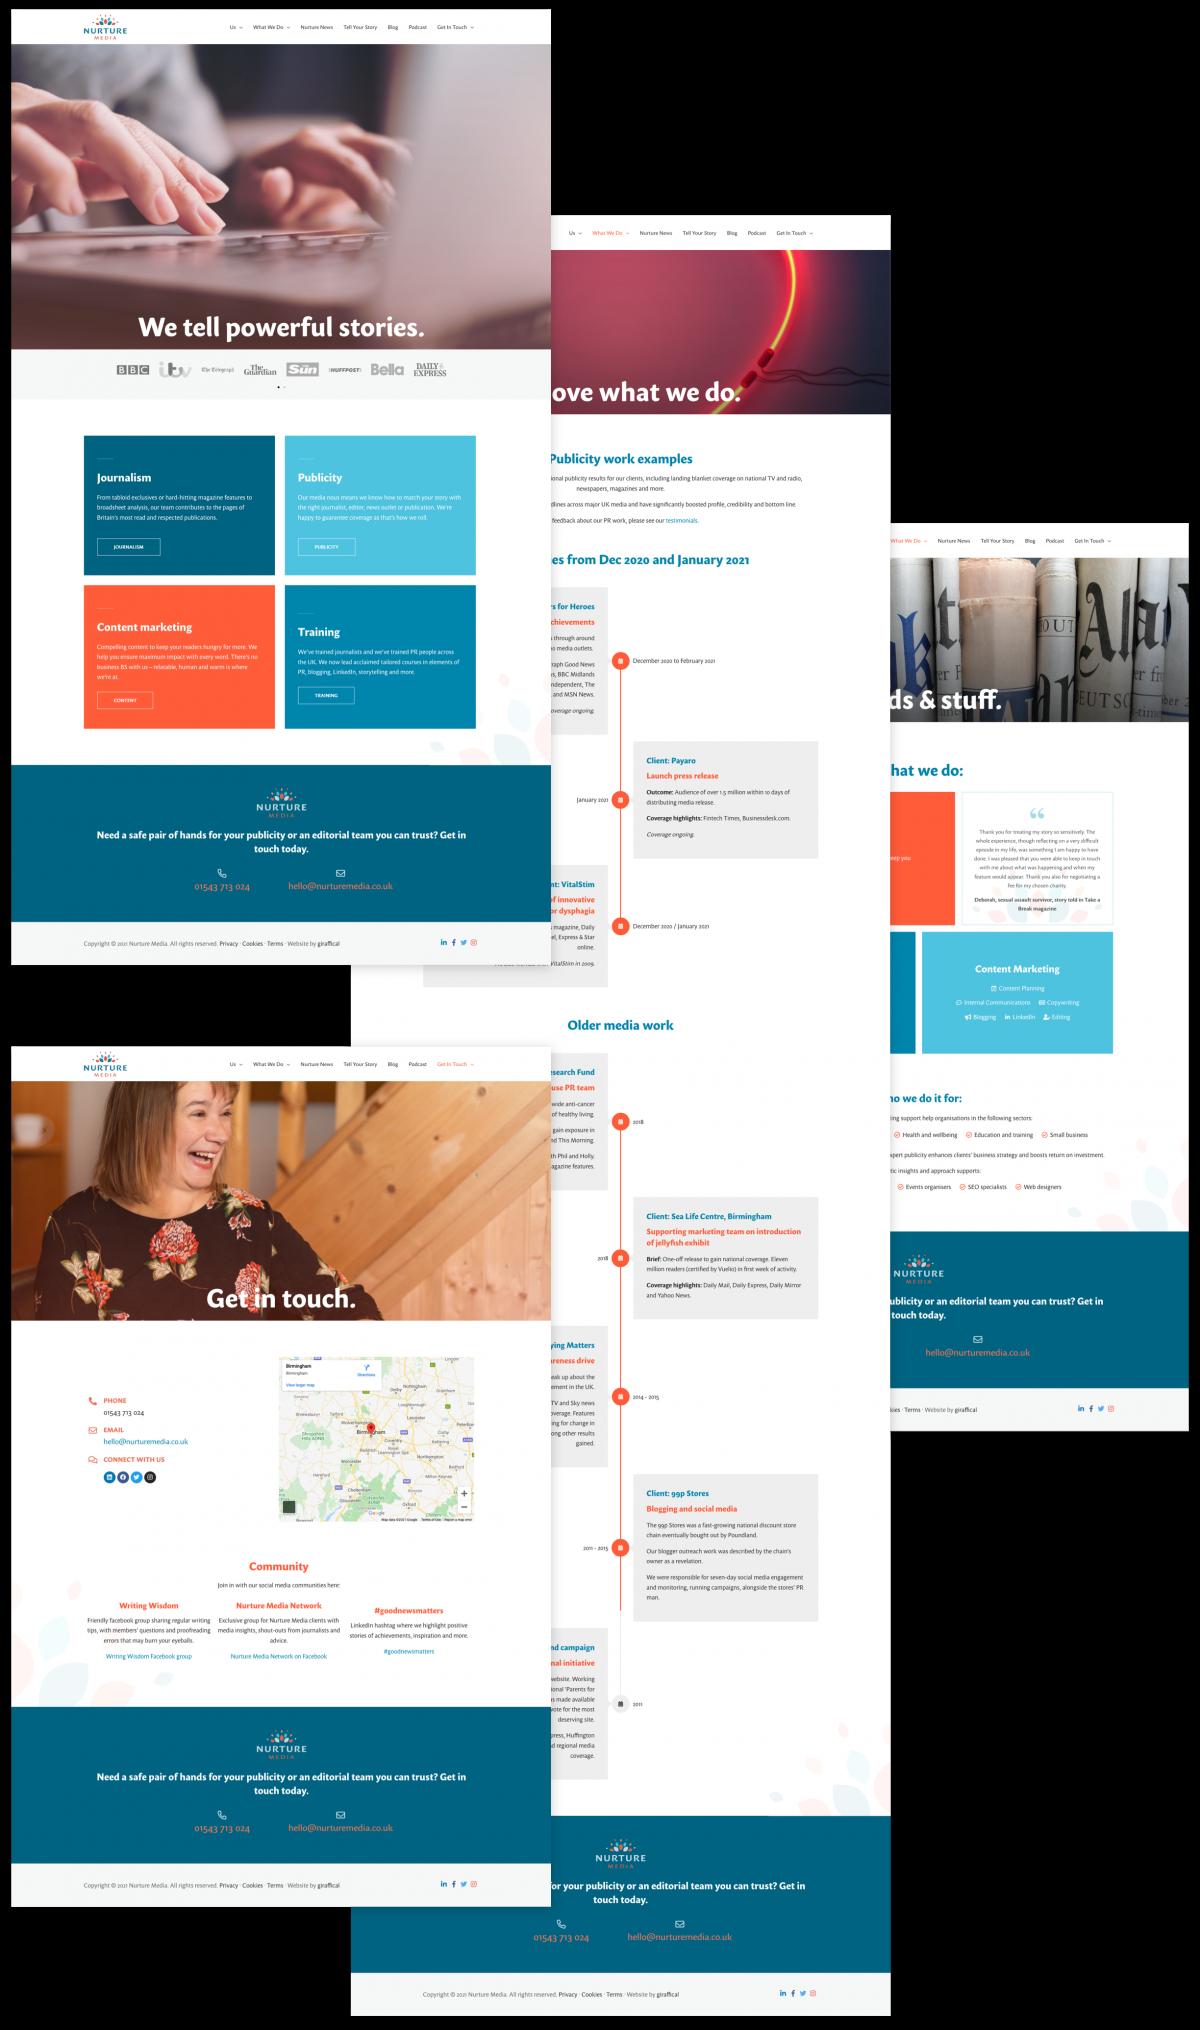 PR Publicity Agency Website Design - Nurture Media